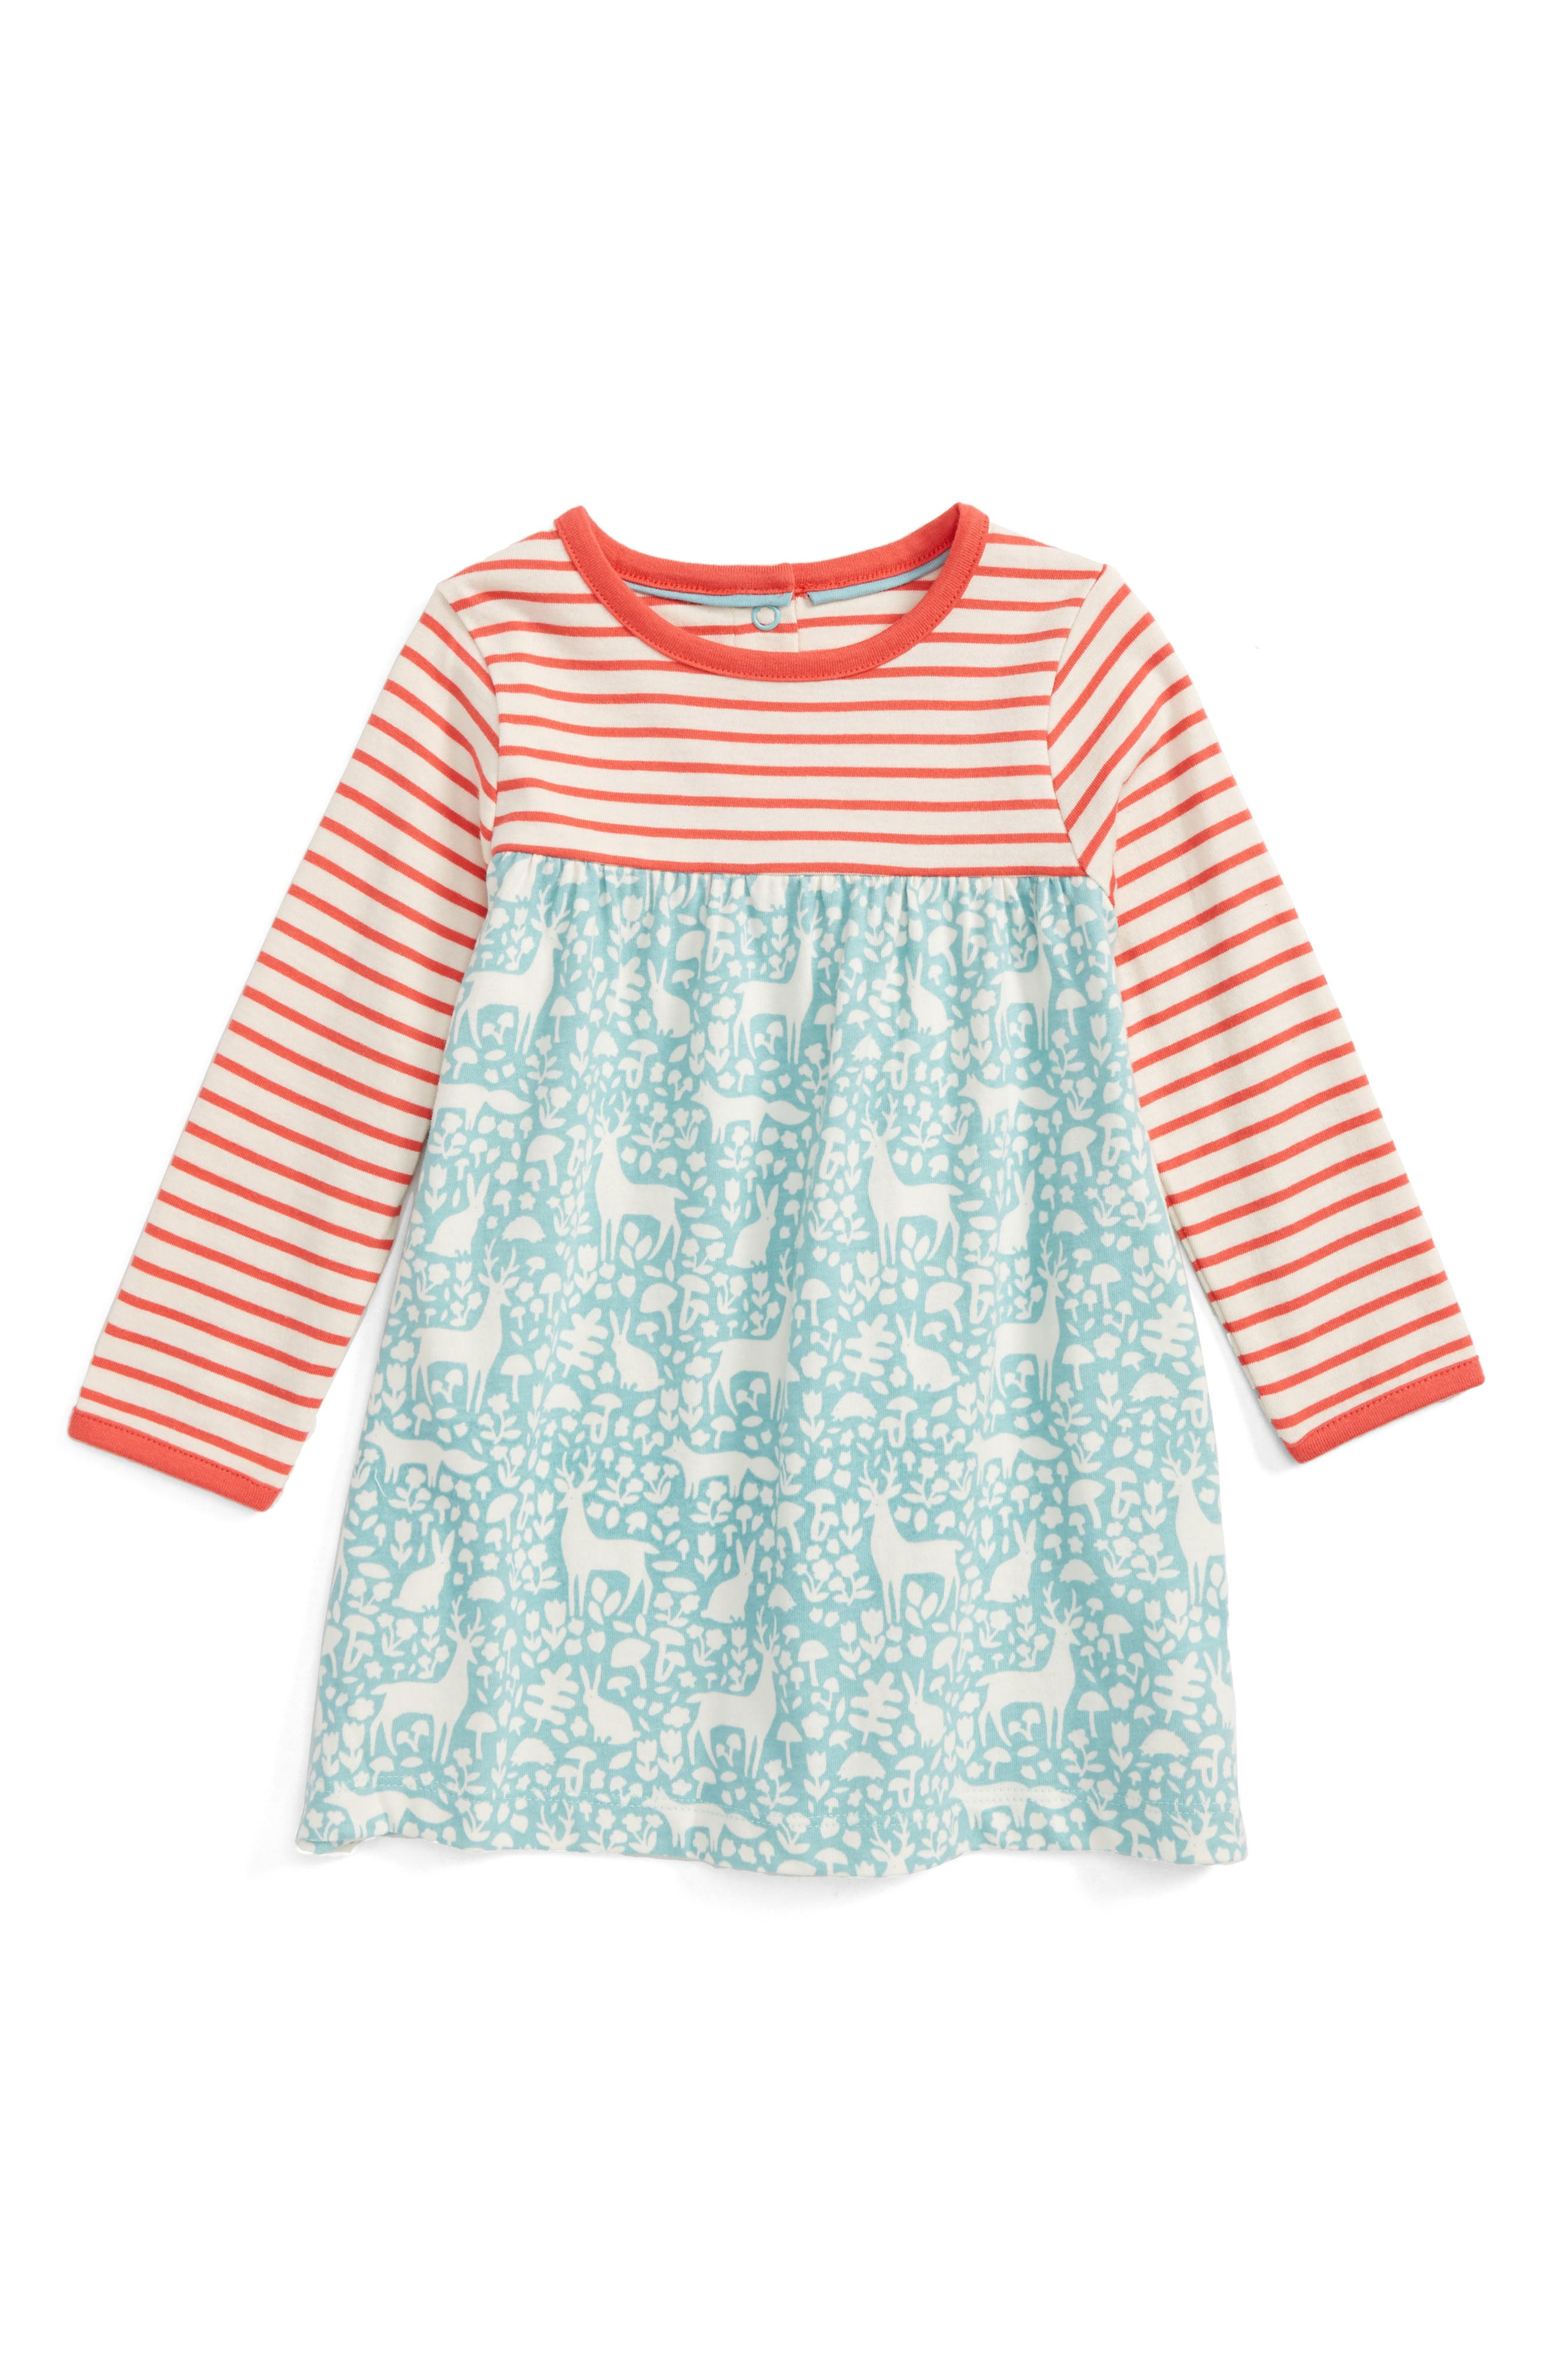 Hotchpotch Jersey Dress,                             Main thumbnail 1, color,